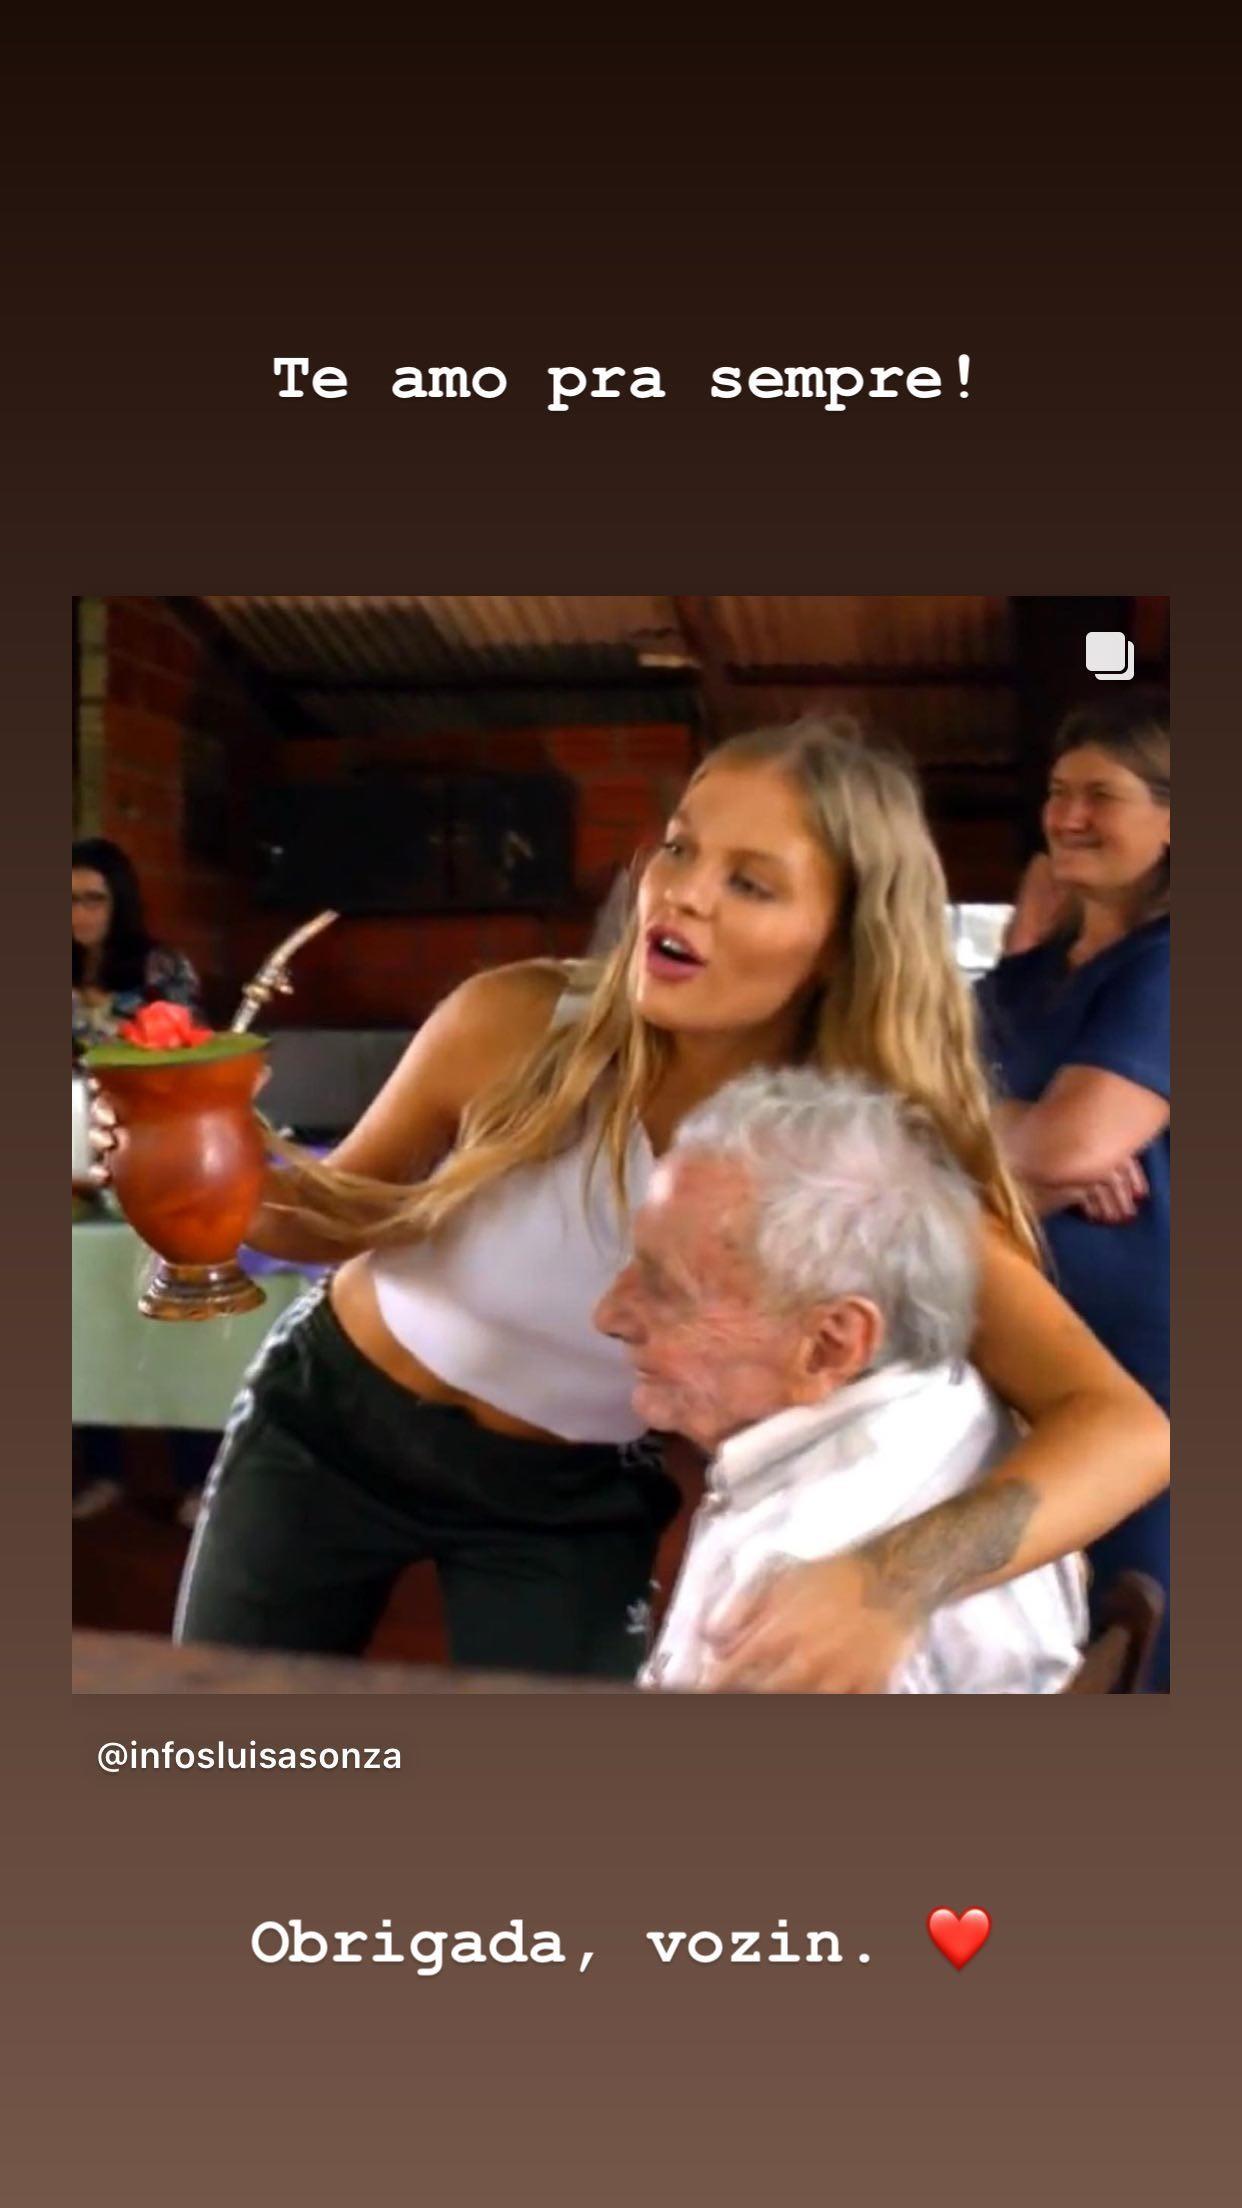 Luísa Sonza lamenta morte do avô (Foto: Reprodução/Instagram)